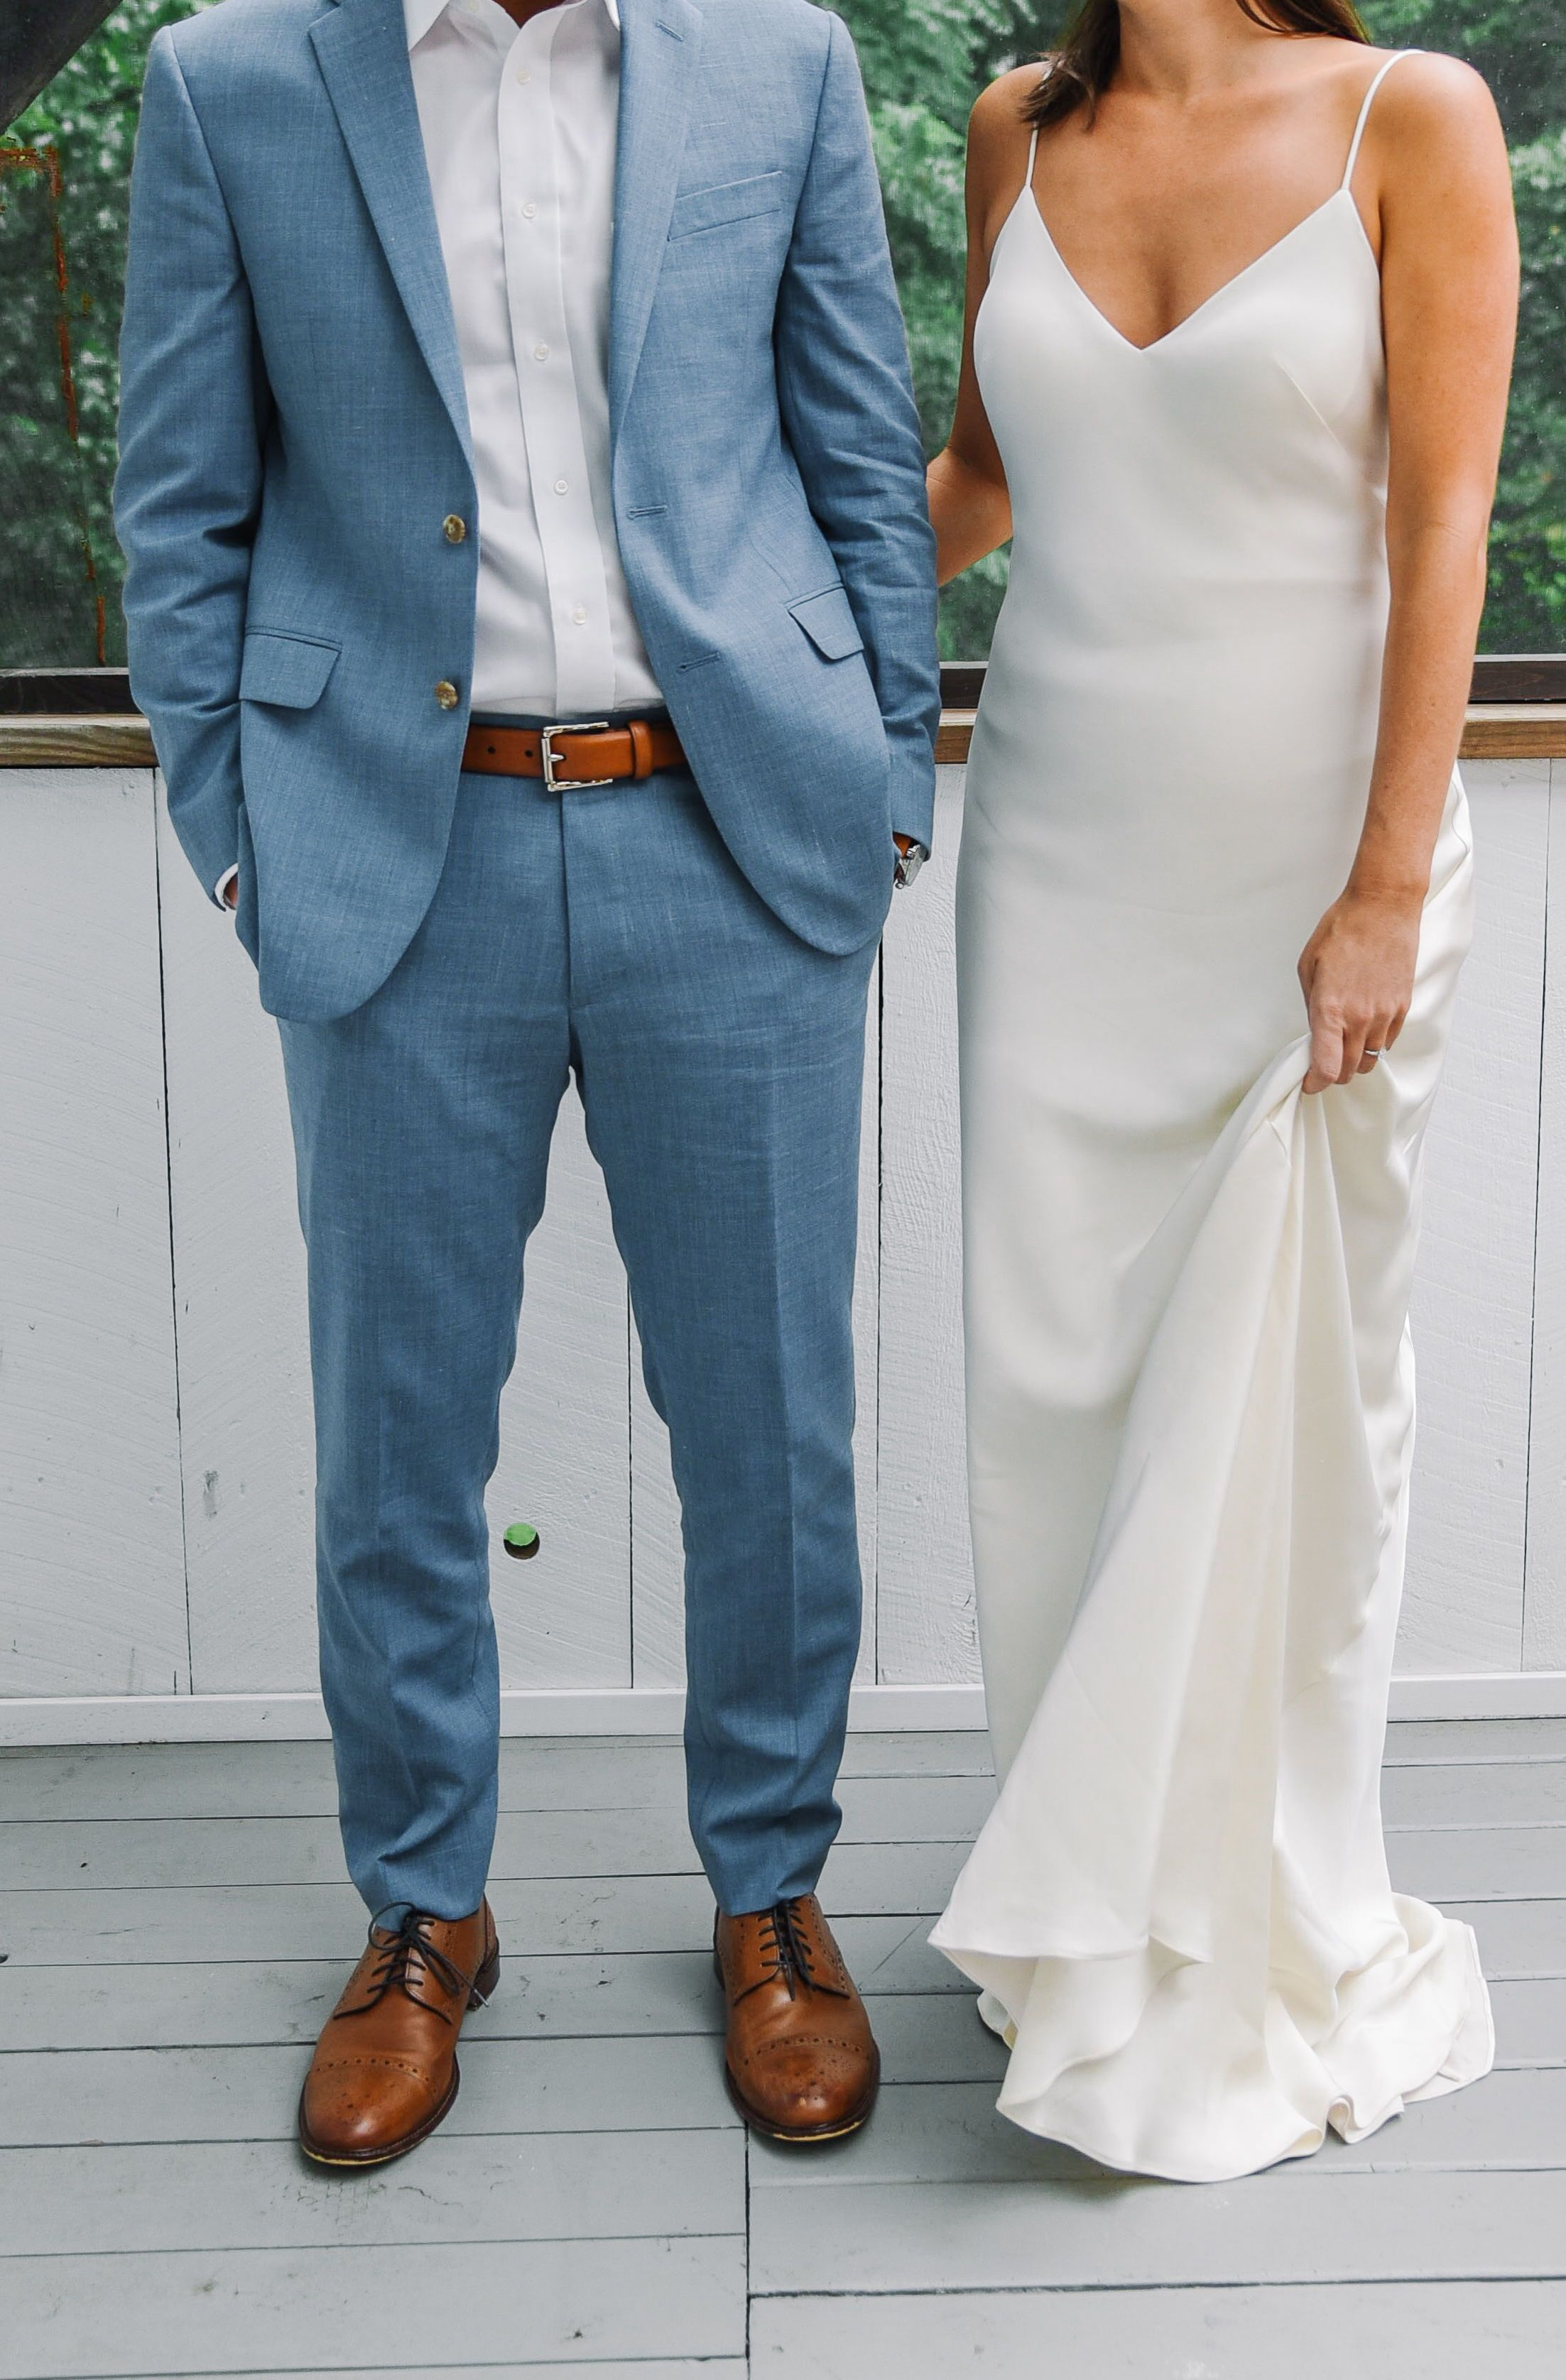 Simply Stunning Bride The Celine Slip Bridal Gown In 100 Silk 4